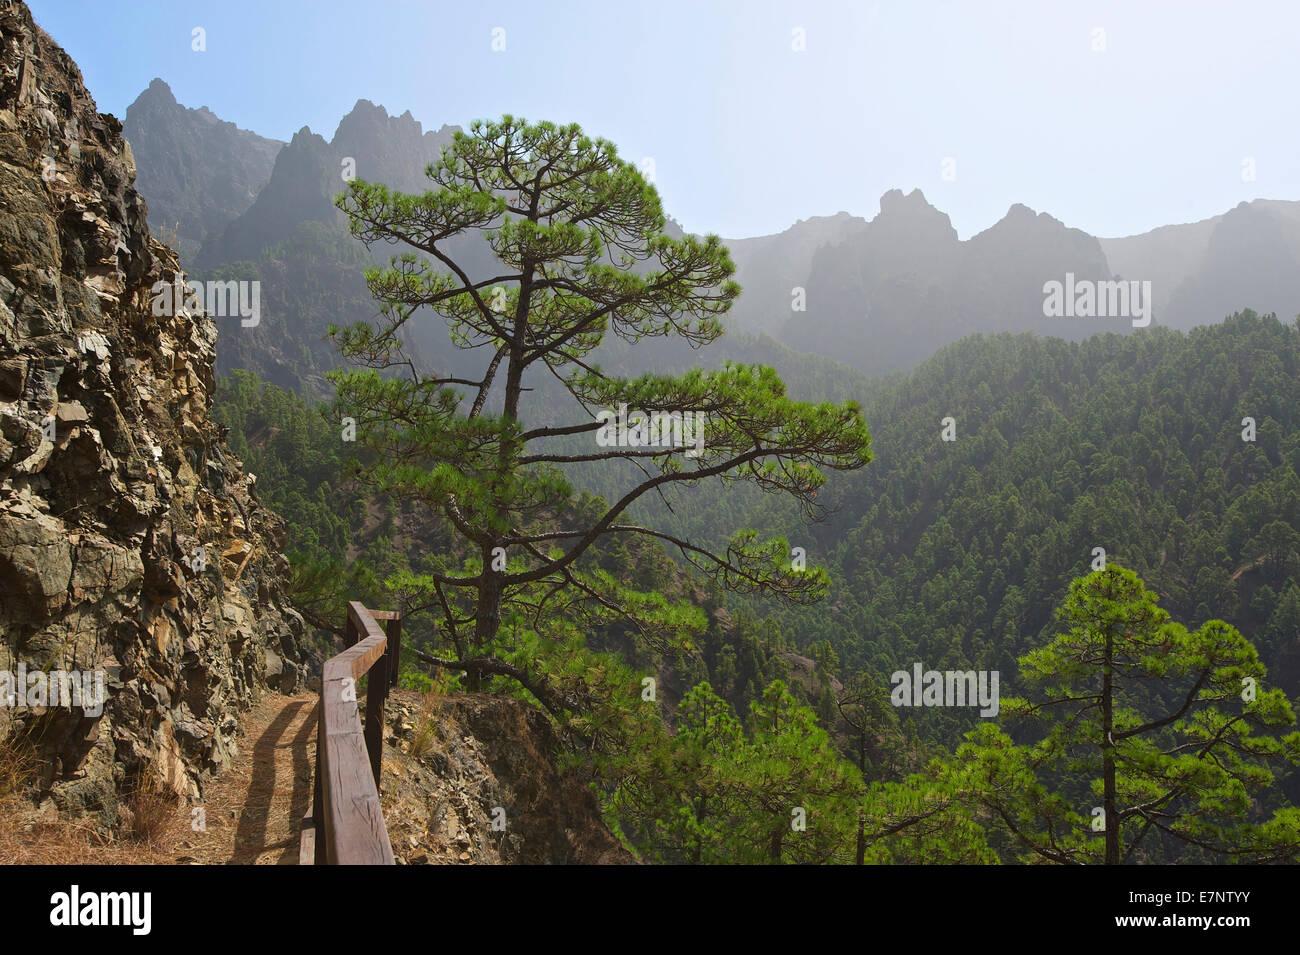 Kanaren, Kanarische Inseln, Inseln, La Palma, Spanien, Europa, draußen, Tag, niemand, Berg, Berge, Berglandschaft, Stockbild